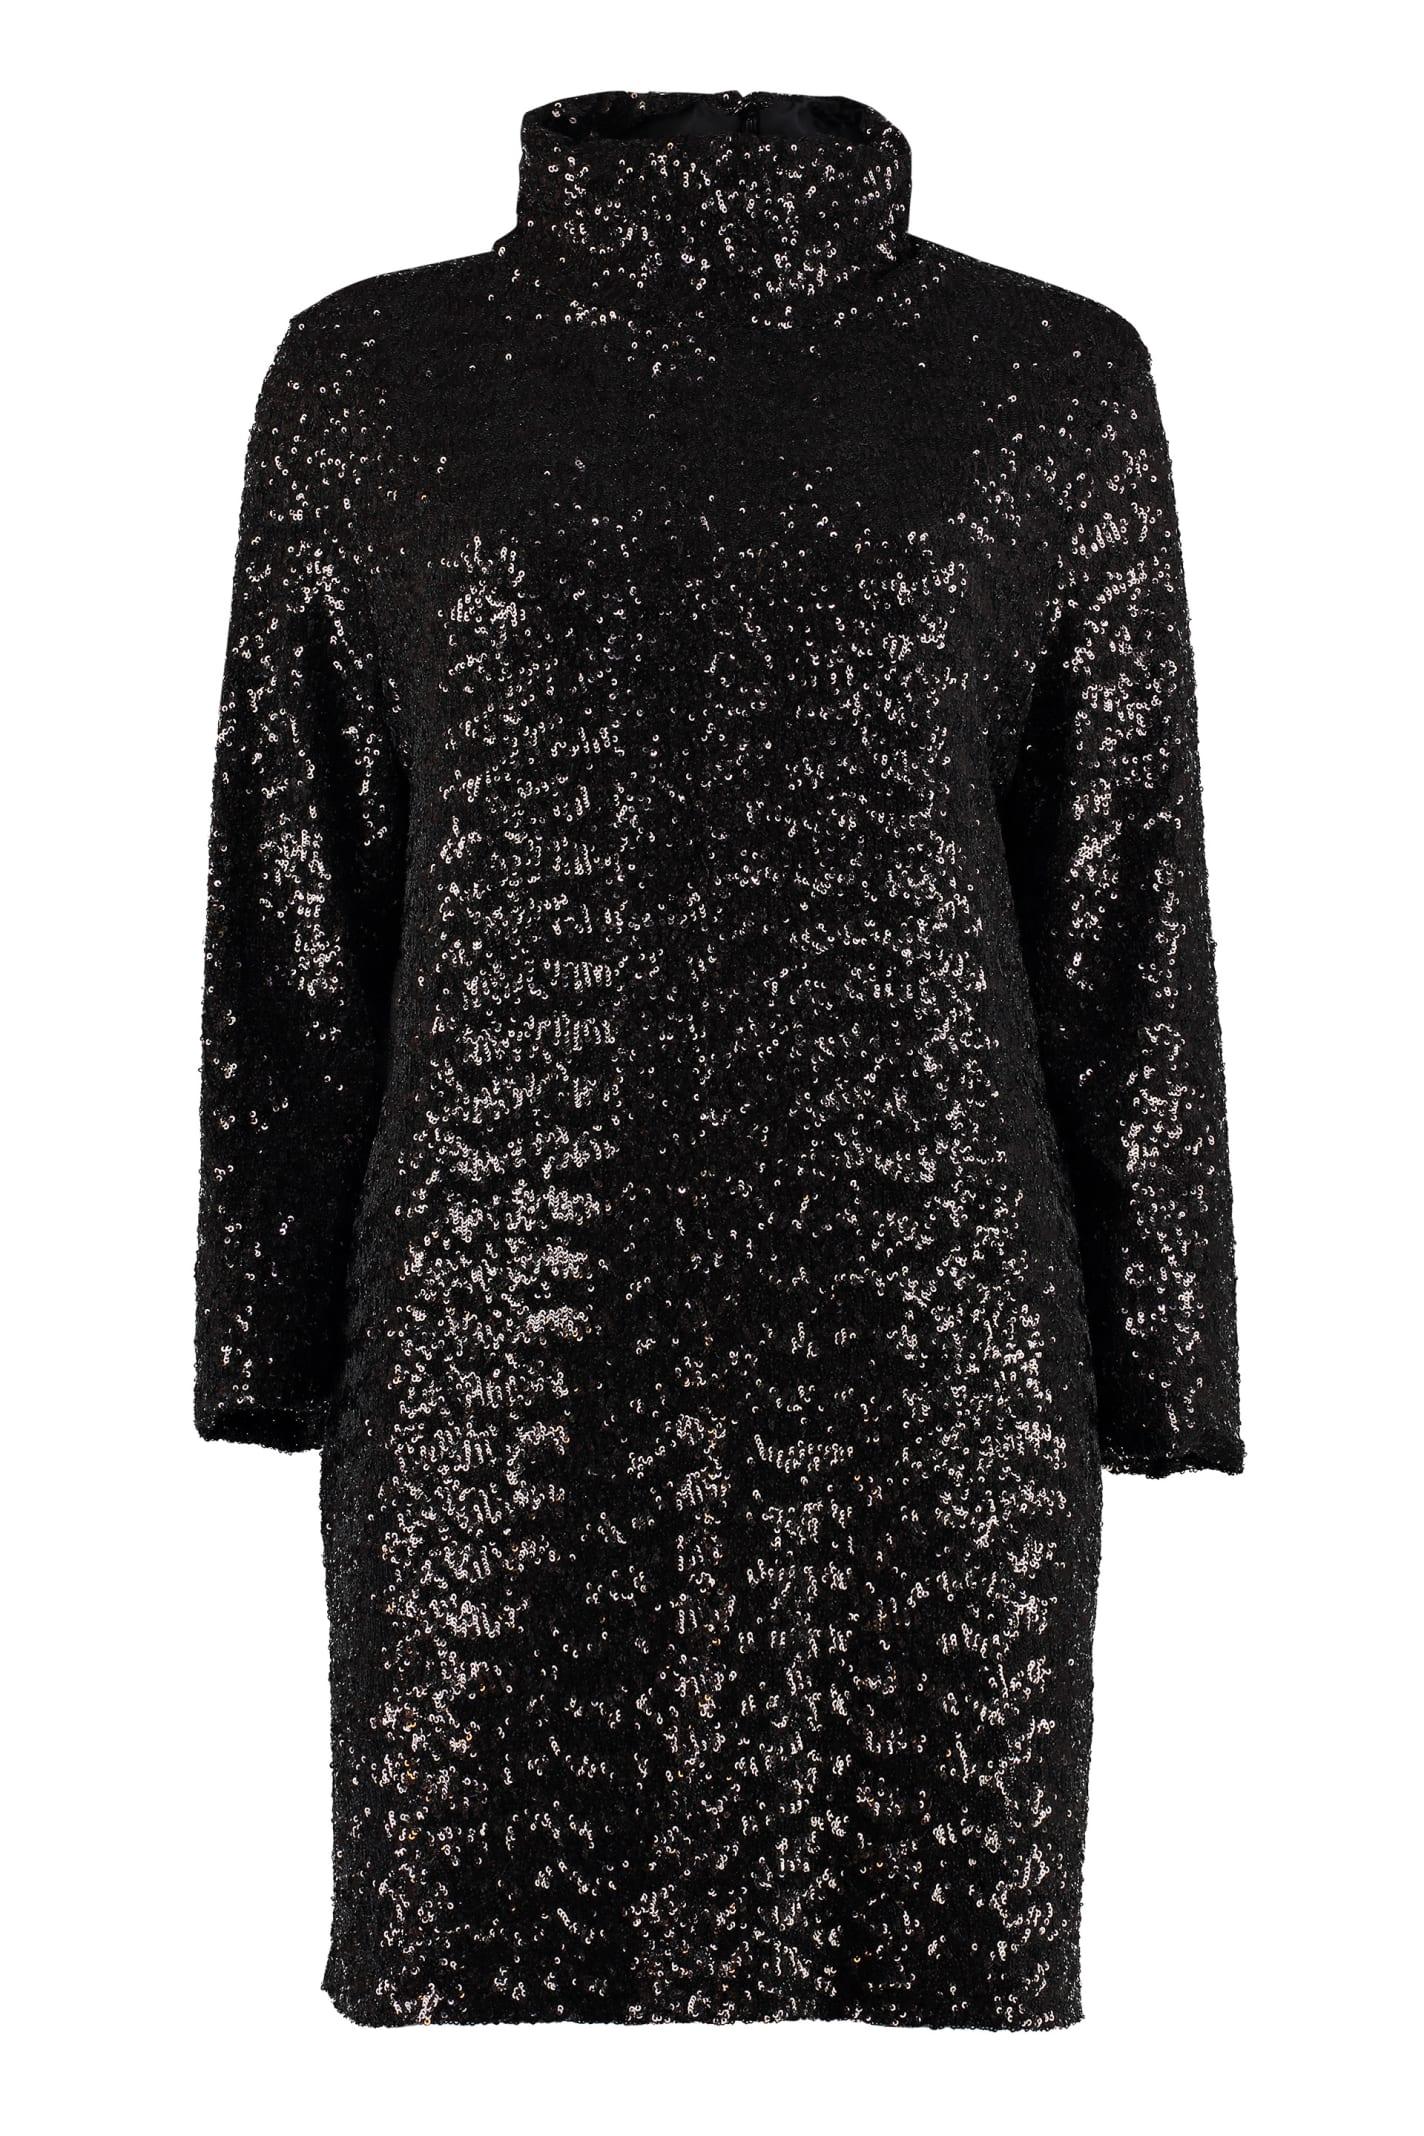 Photo of  Fabiana Filippi Sequin Mini-dress- shop Fabiana Filippi  online sales